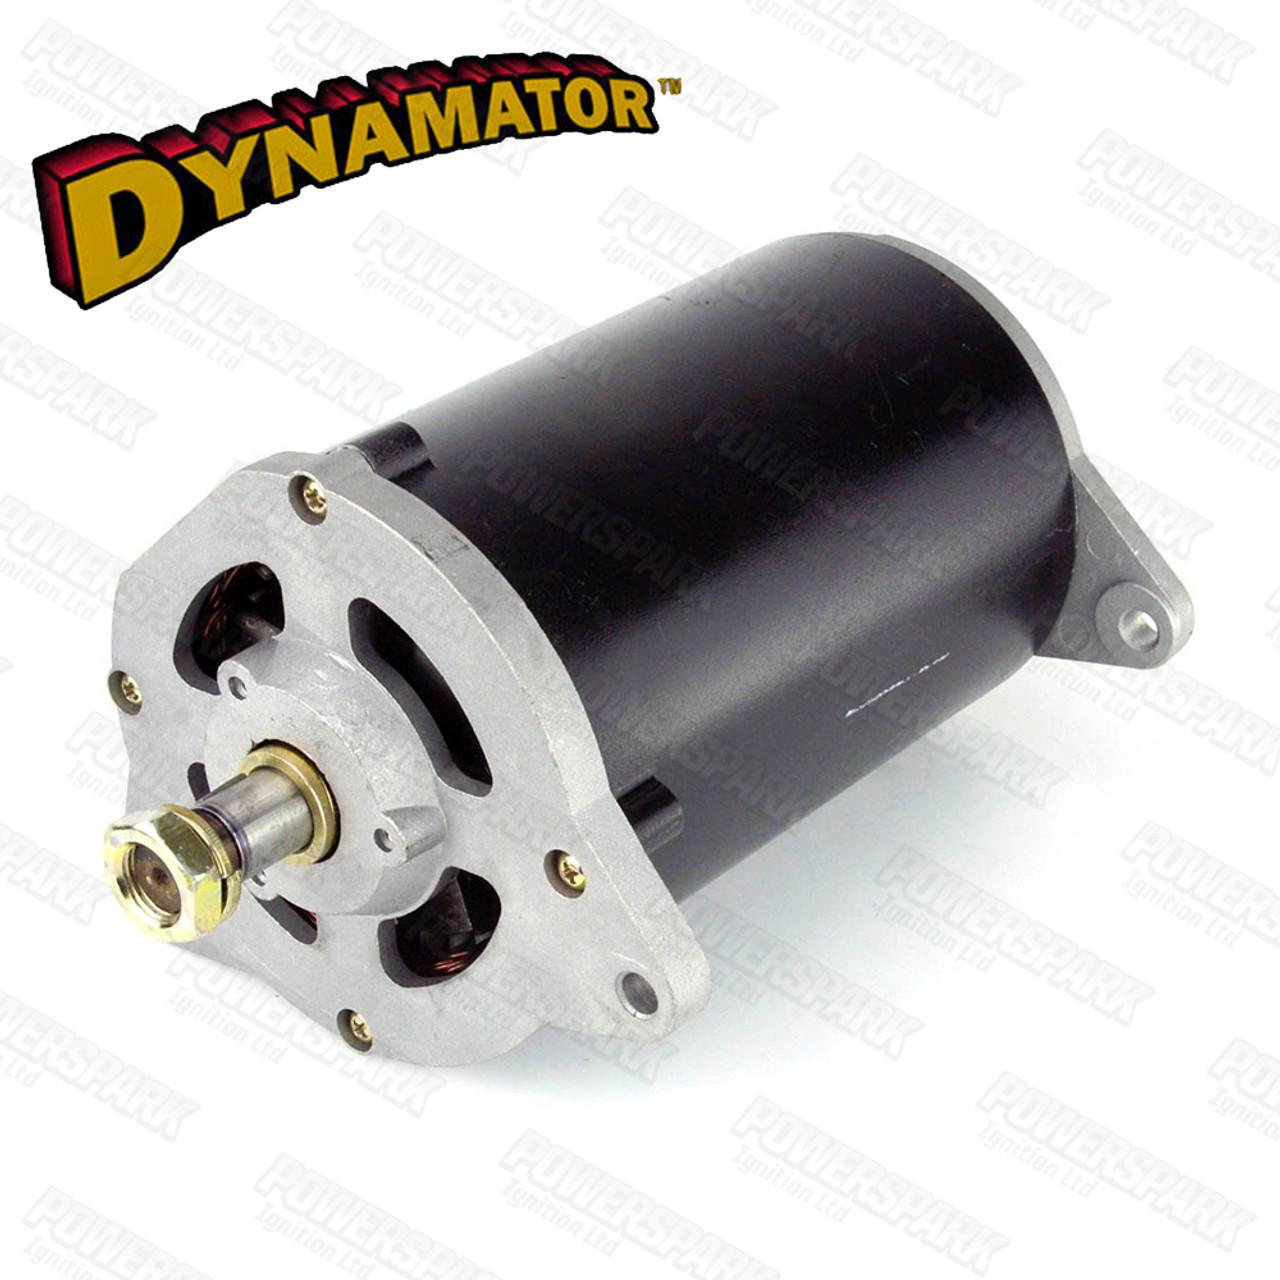 Stealth Dynamator - Dynamo to Alternator Conversion replaces Lucas C45 Dynamo - Pos Earth